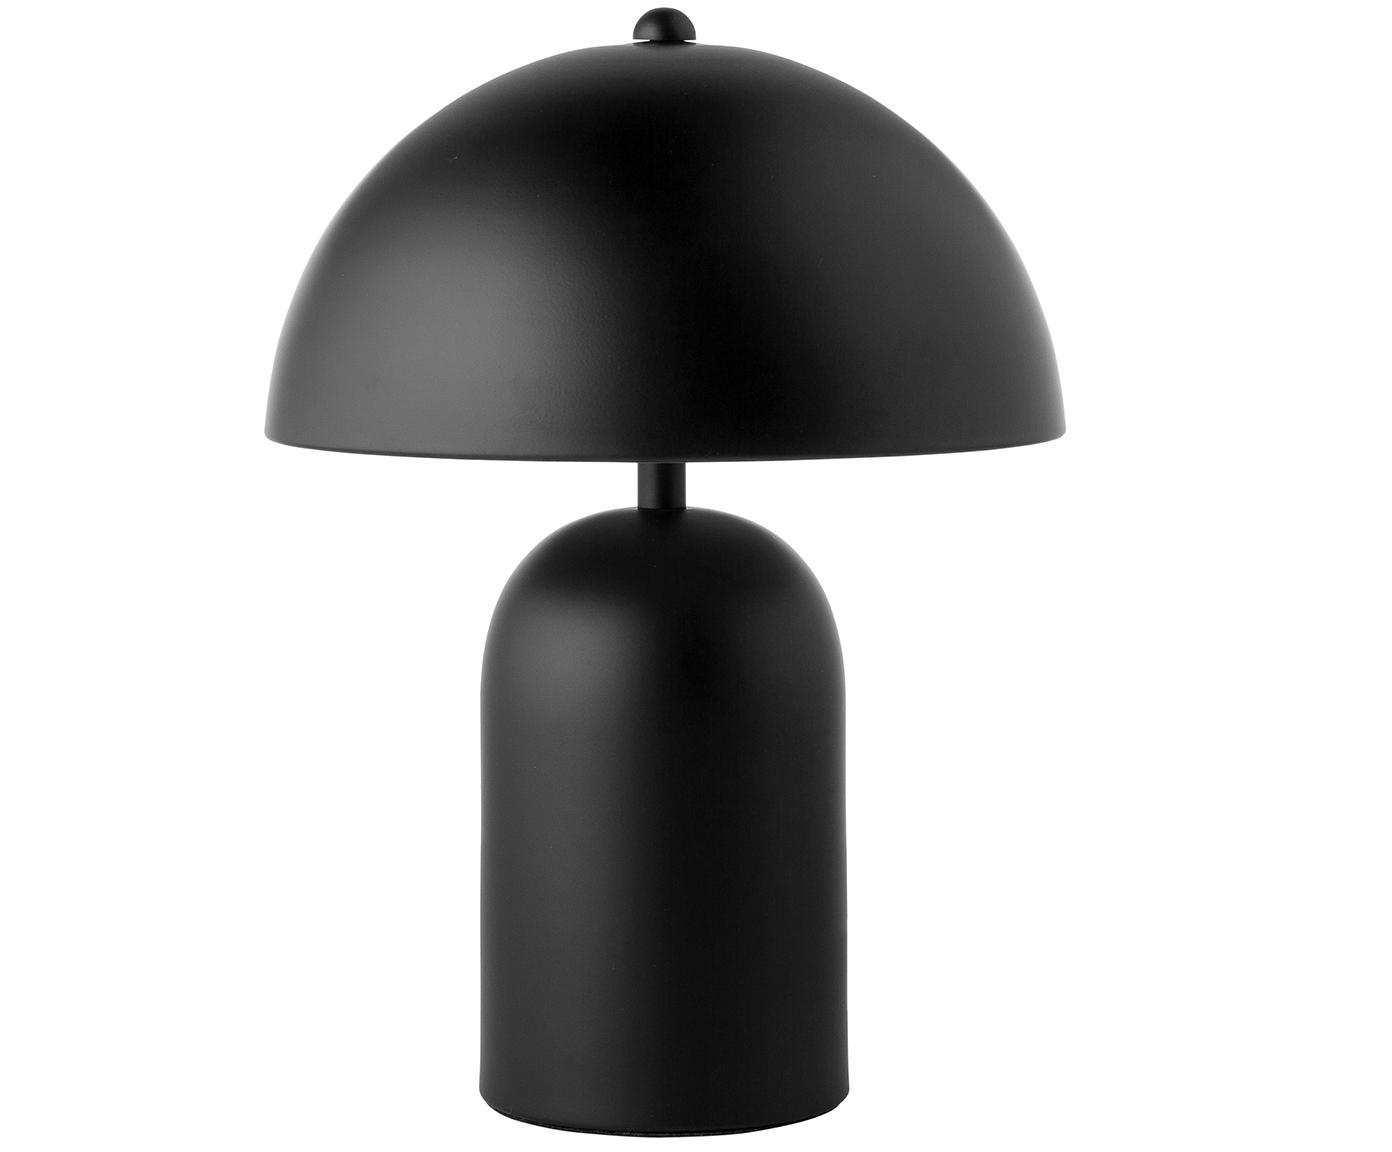 Lámpara de mesaWalter, estilo retro, Pantalla: metal, Negro mate, Ø 25 x Al 33 cm